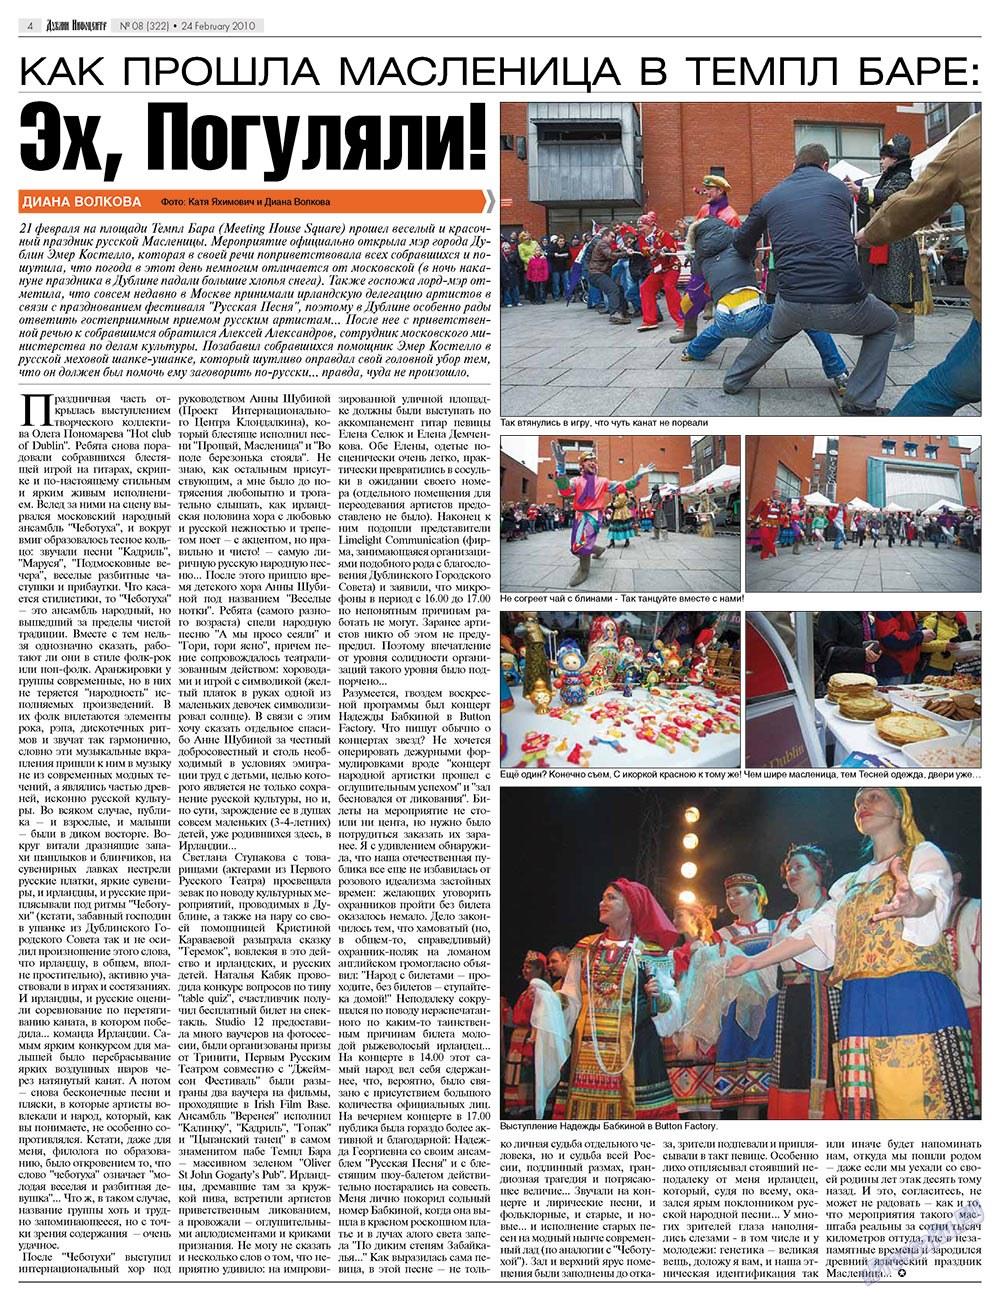 Дублин инфоцентр (газета). 2010 год, номер 8, стр. 4